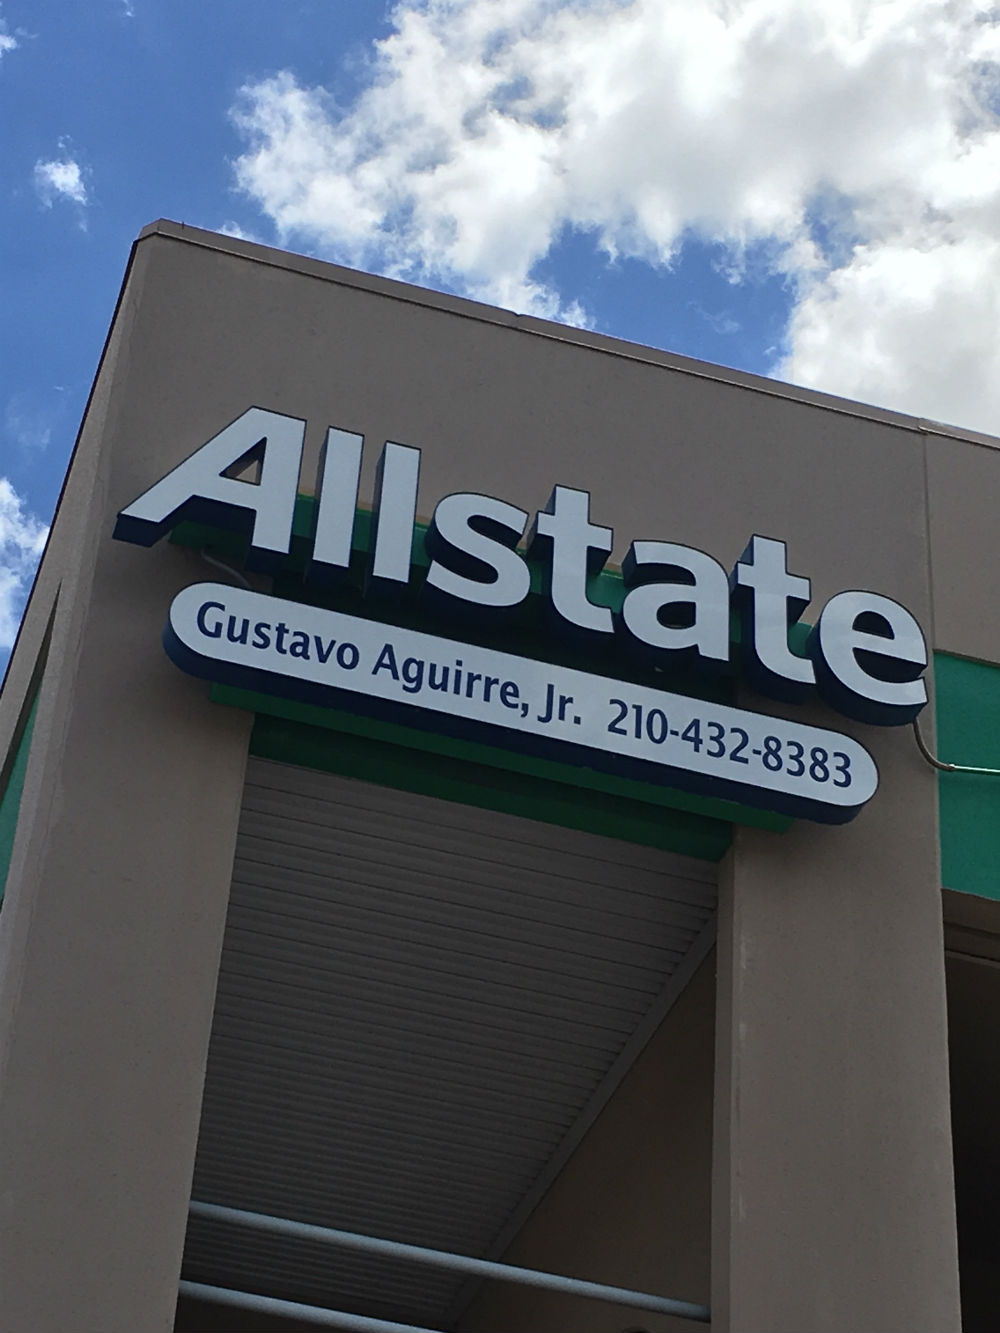 Gustavo Aguirre Jr: Allstate Insurance image 2